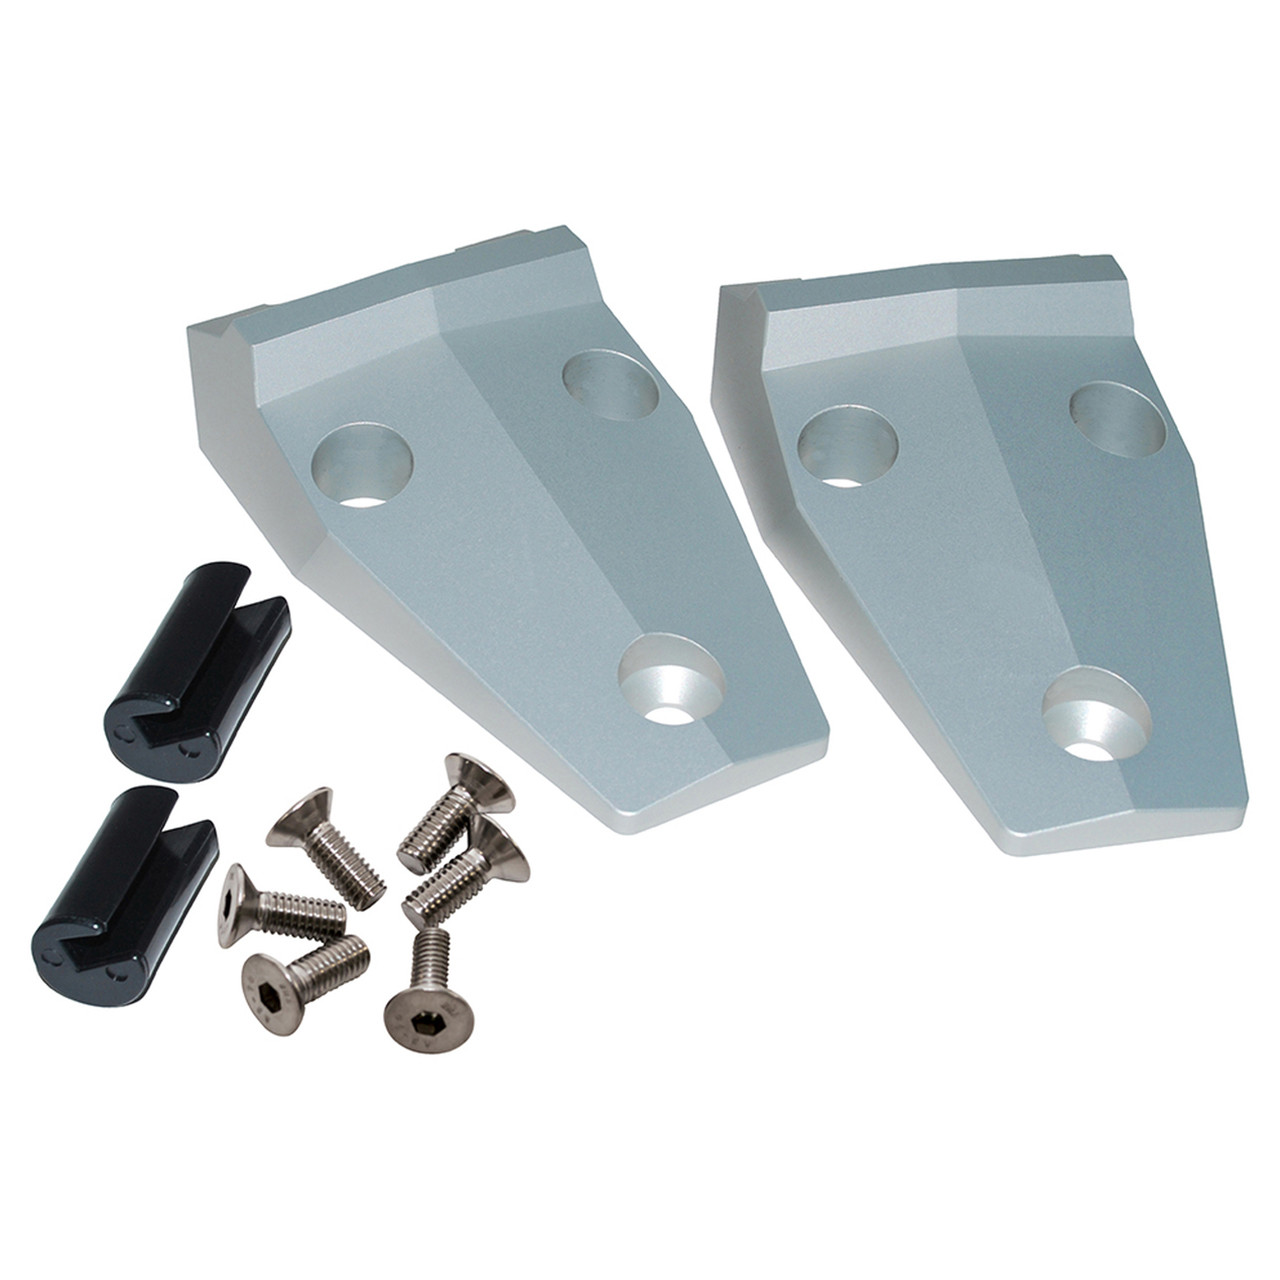 2x Gasdruck Stossdämpfer Staubschutz Satz hinten links rechts Honda Jazz GE